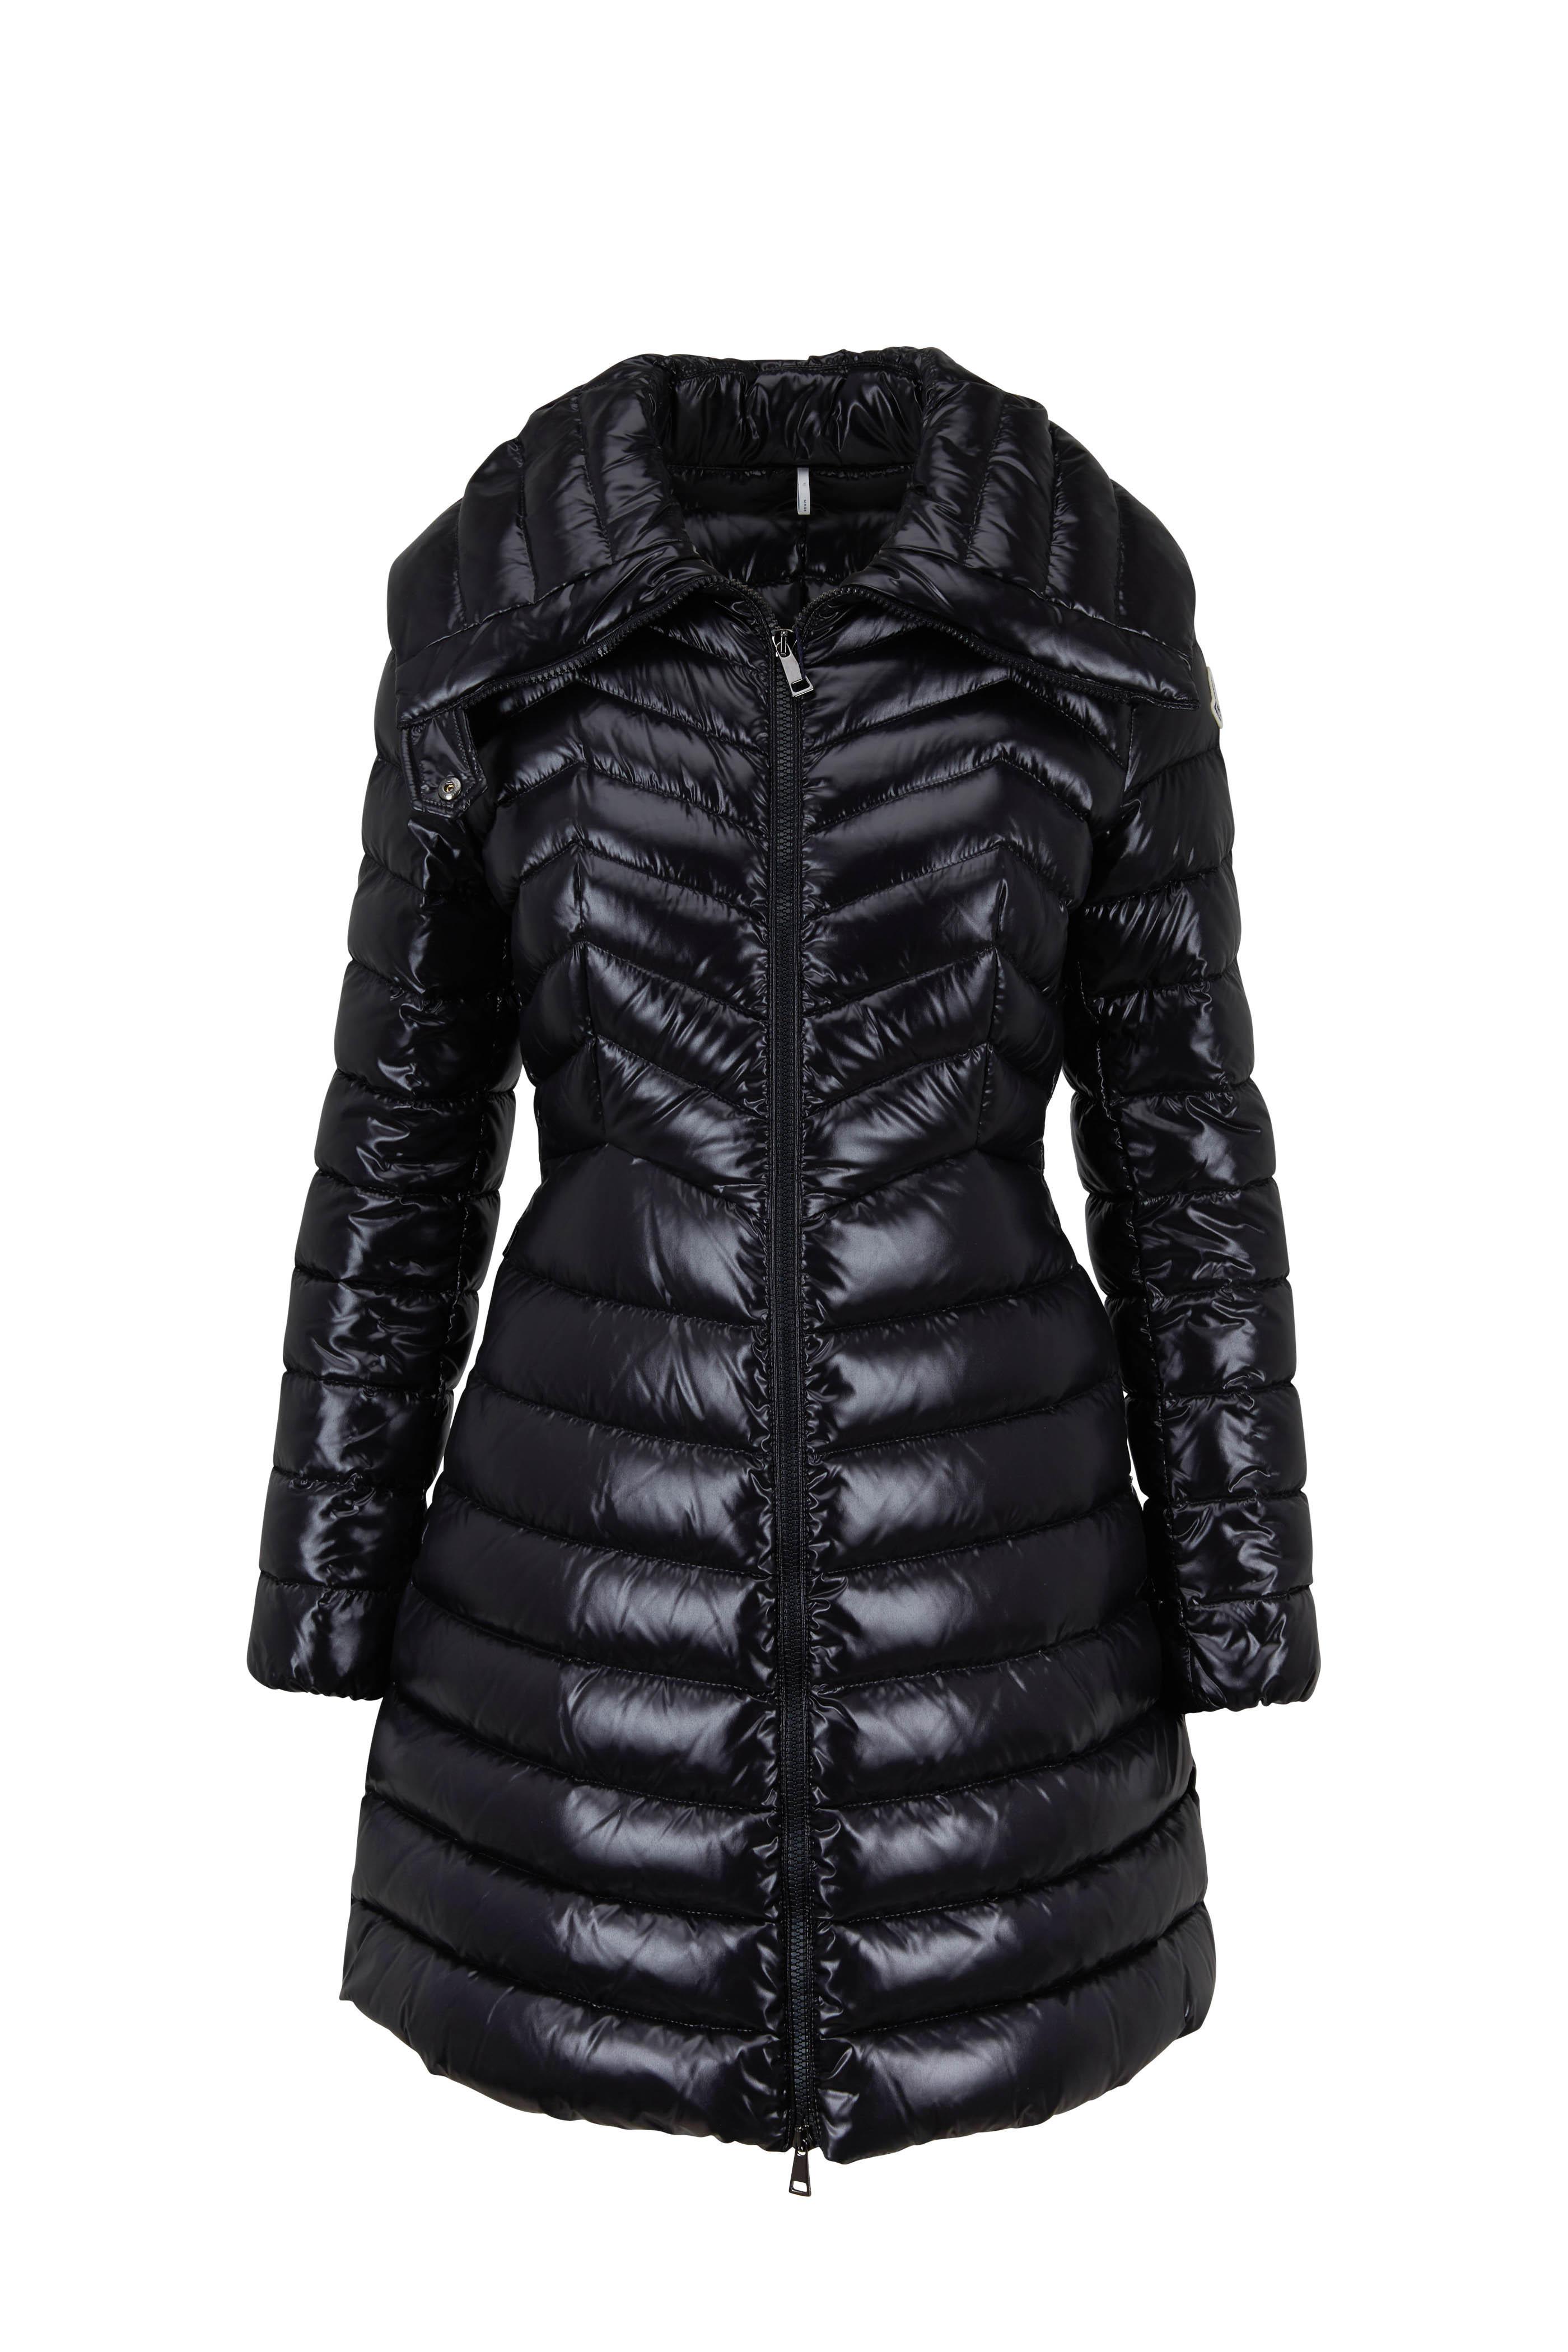 ffac3ebfb69a Moncler - Faucon Black Shiny Puffer Coat